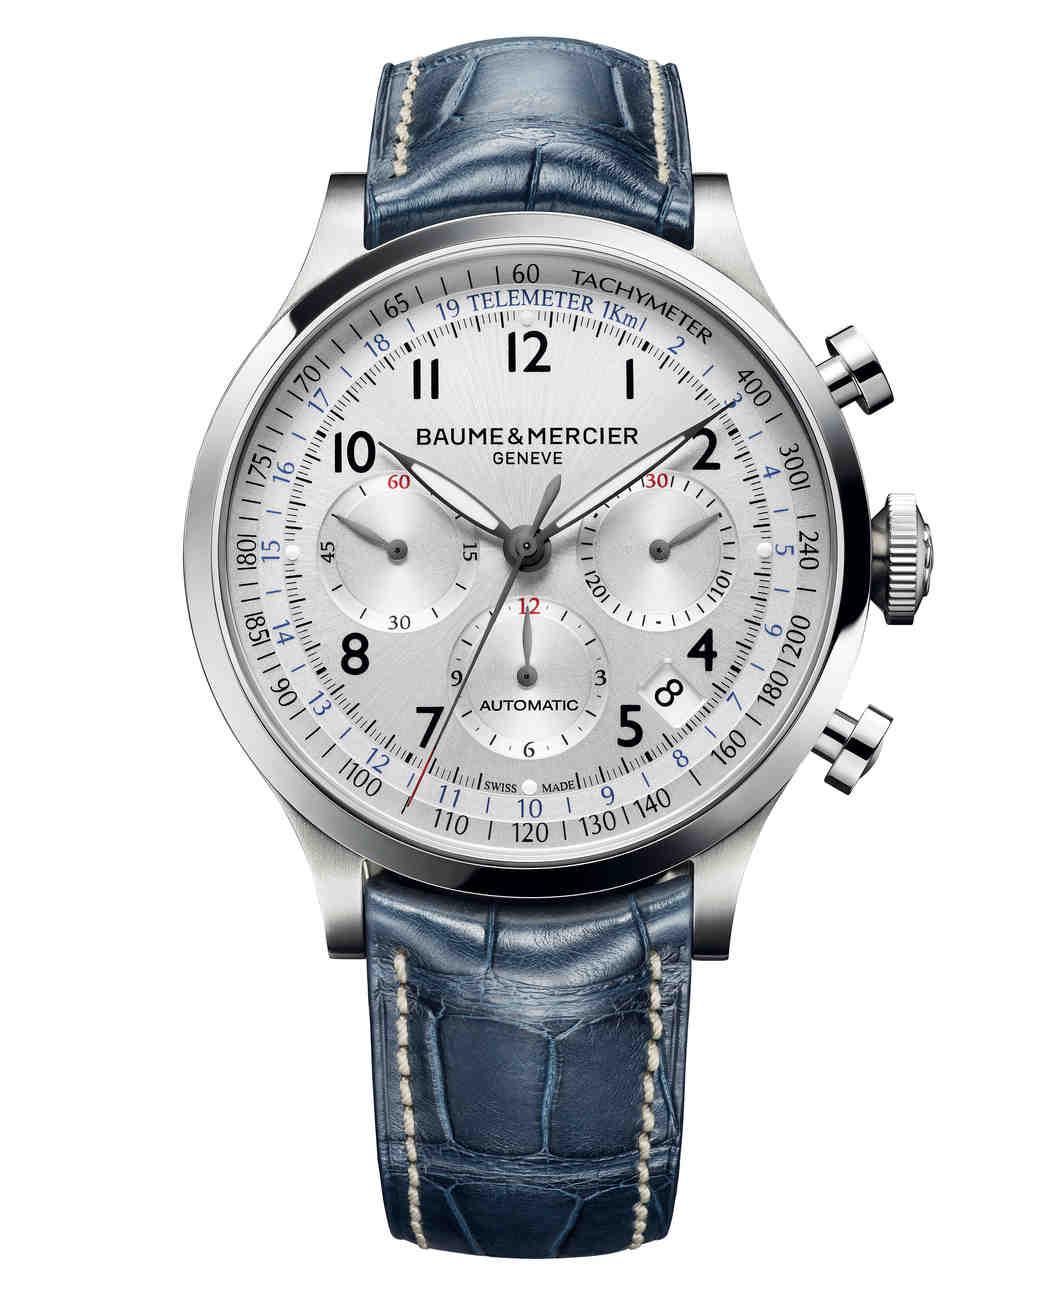 baume-mercier-watch-capeland-10063-0514.jpg